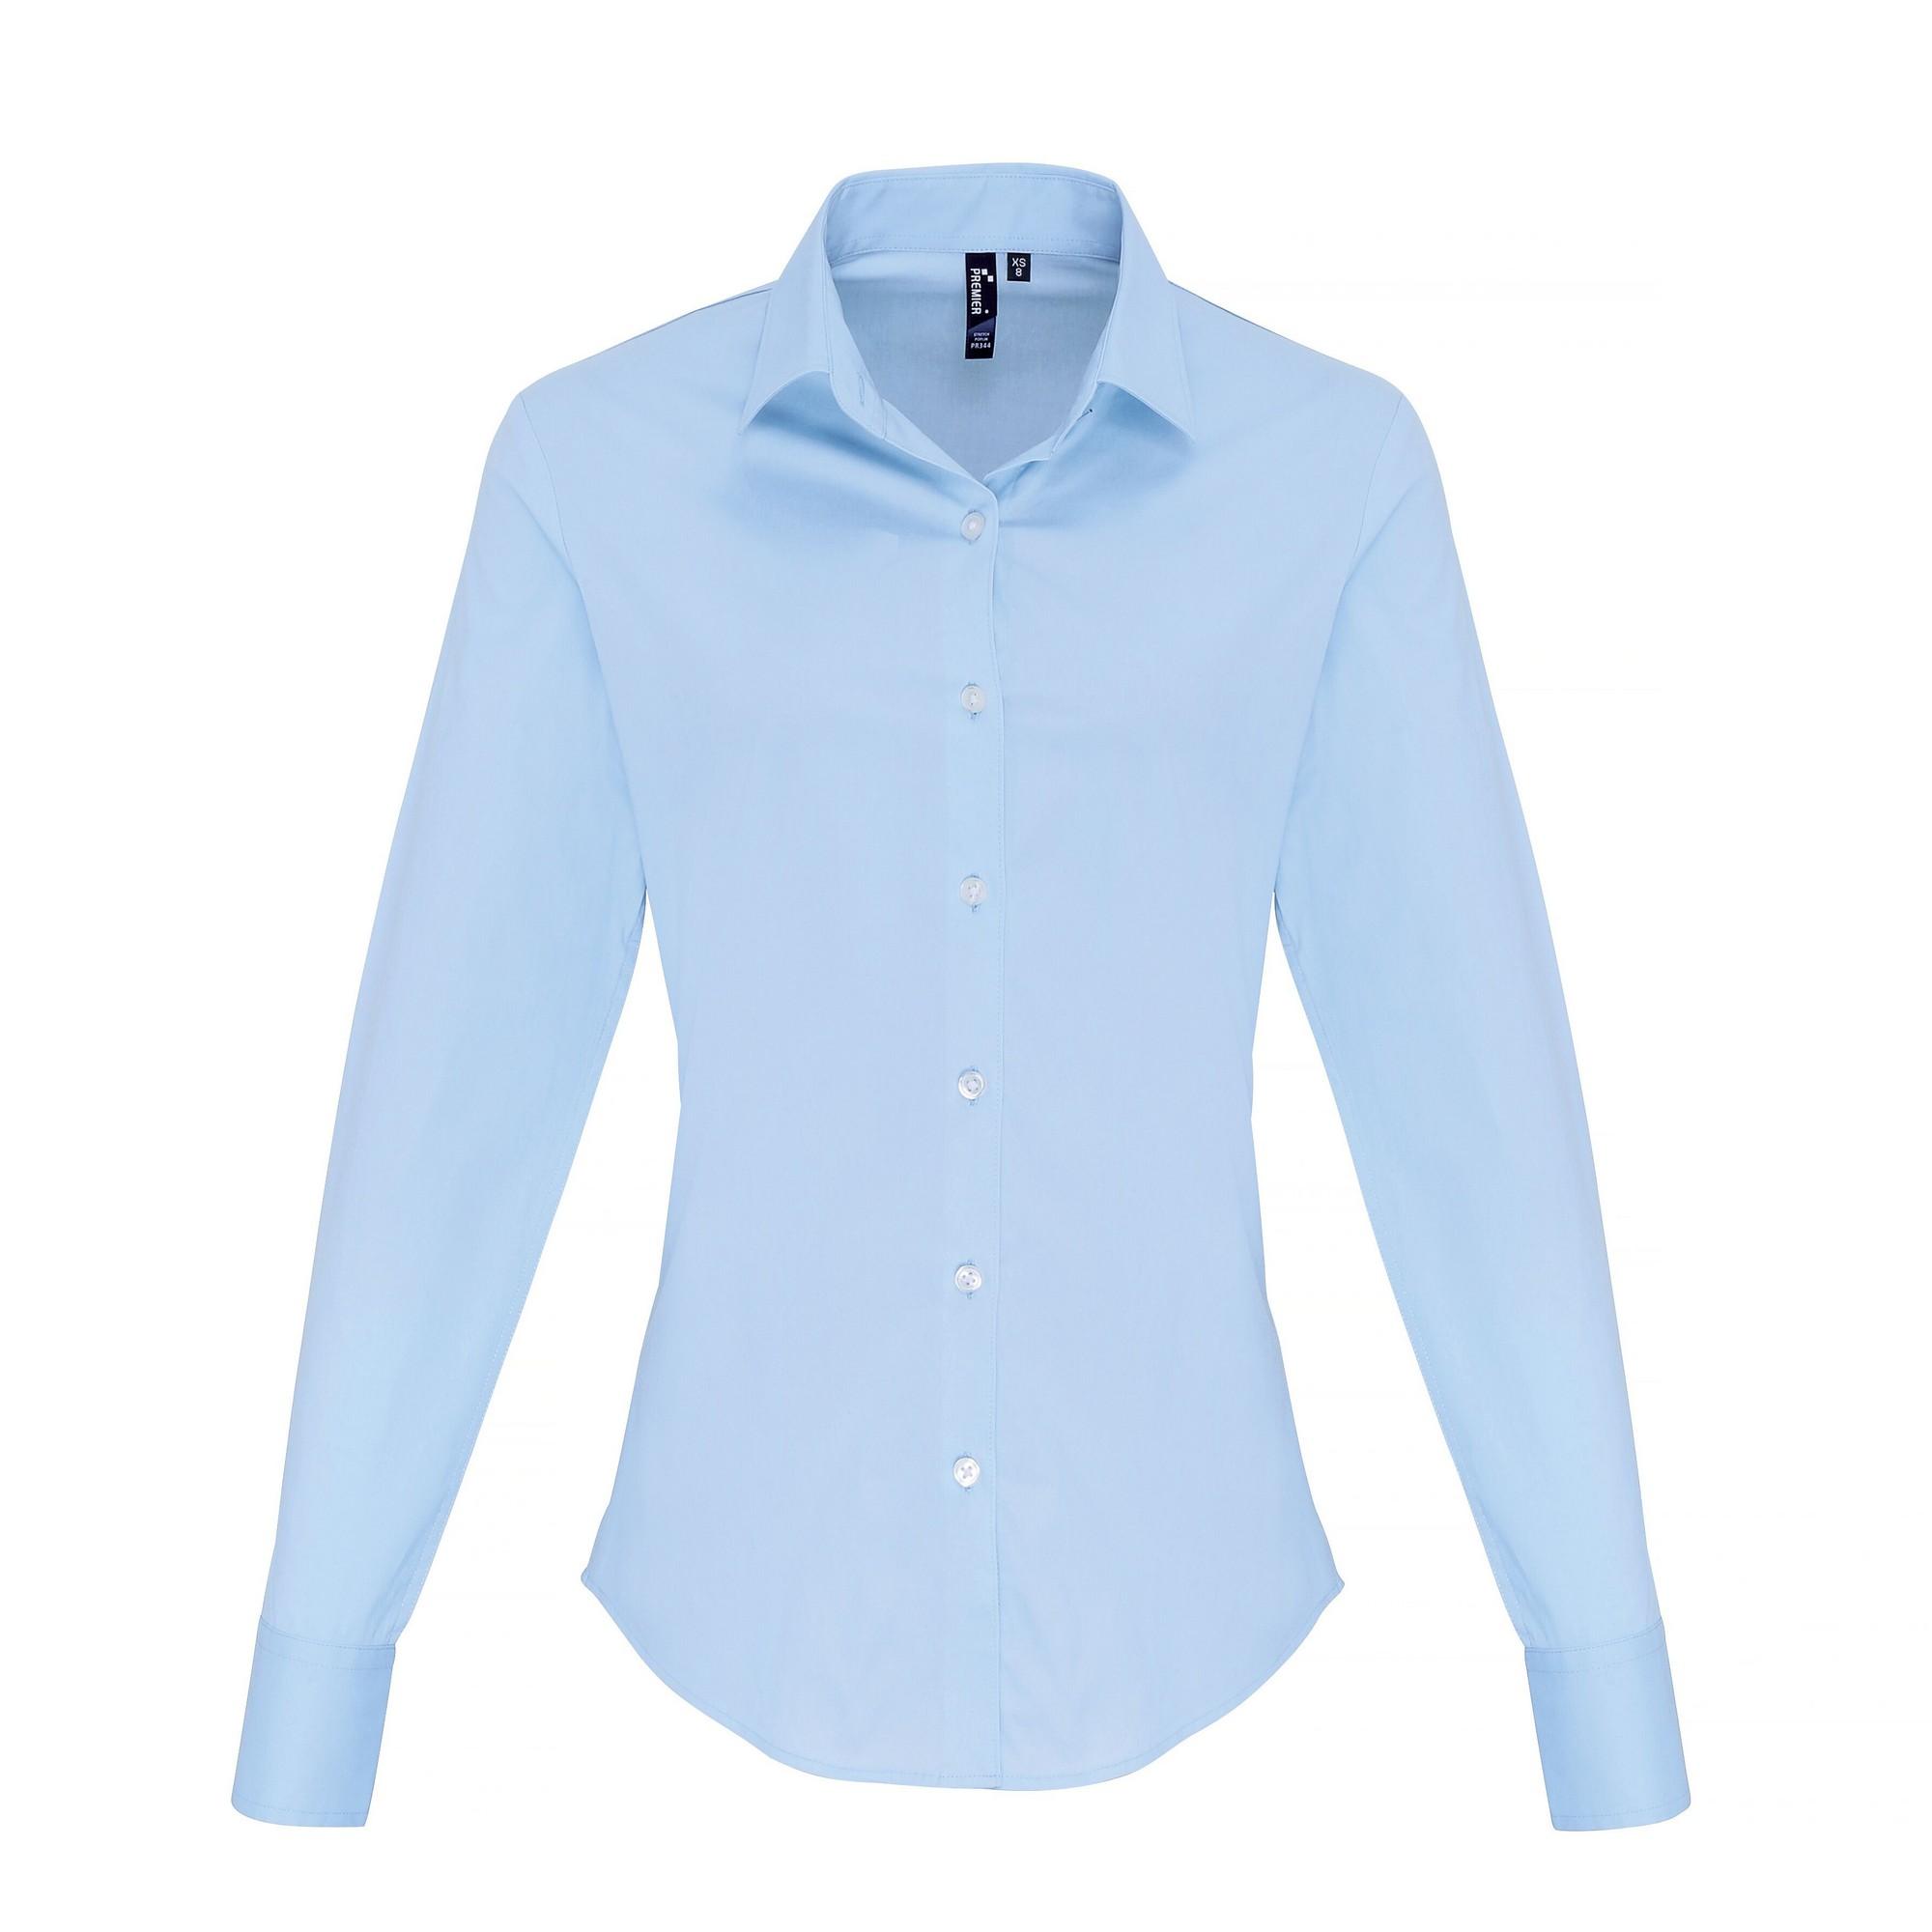 Premier Womens/Ladies Stretch Fit Poplin Long Sleeve Blouse (XS) (Pale Blue)